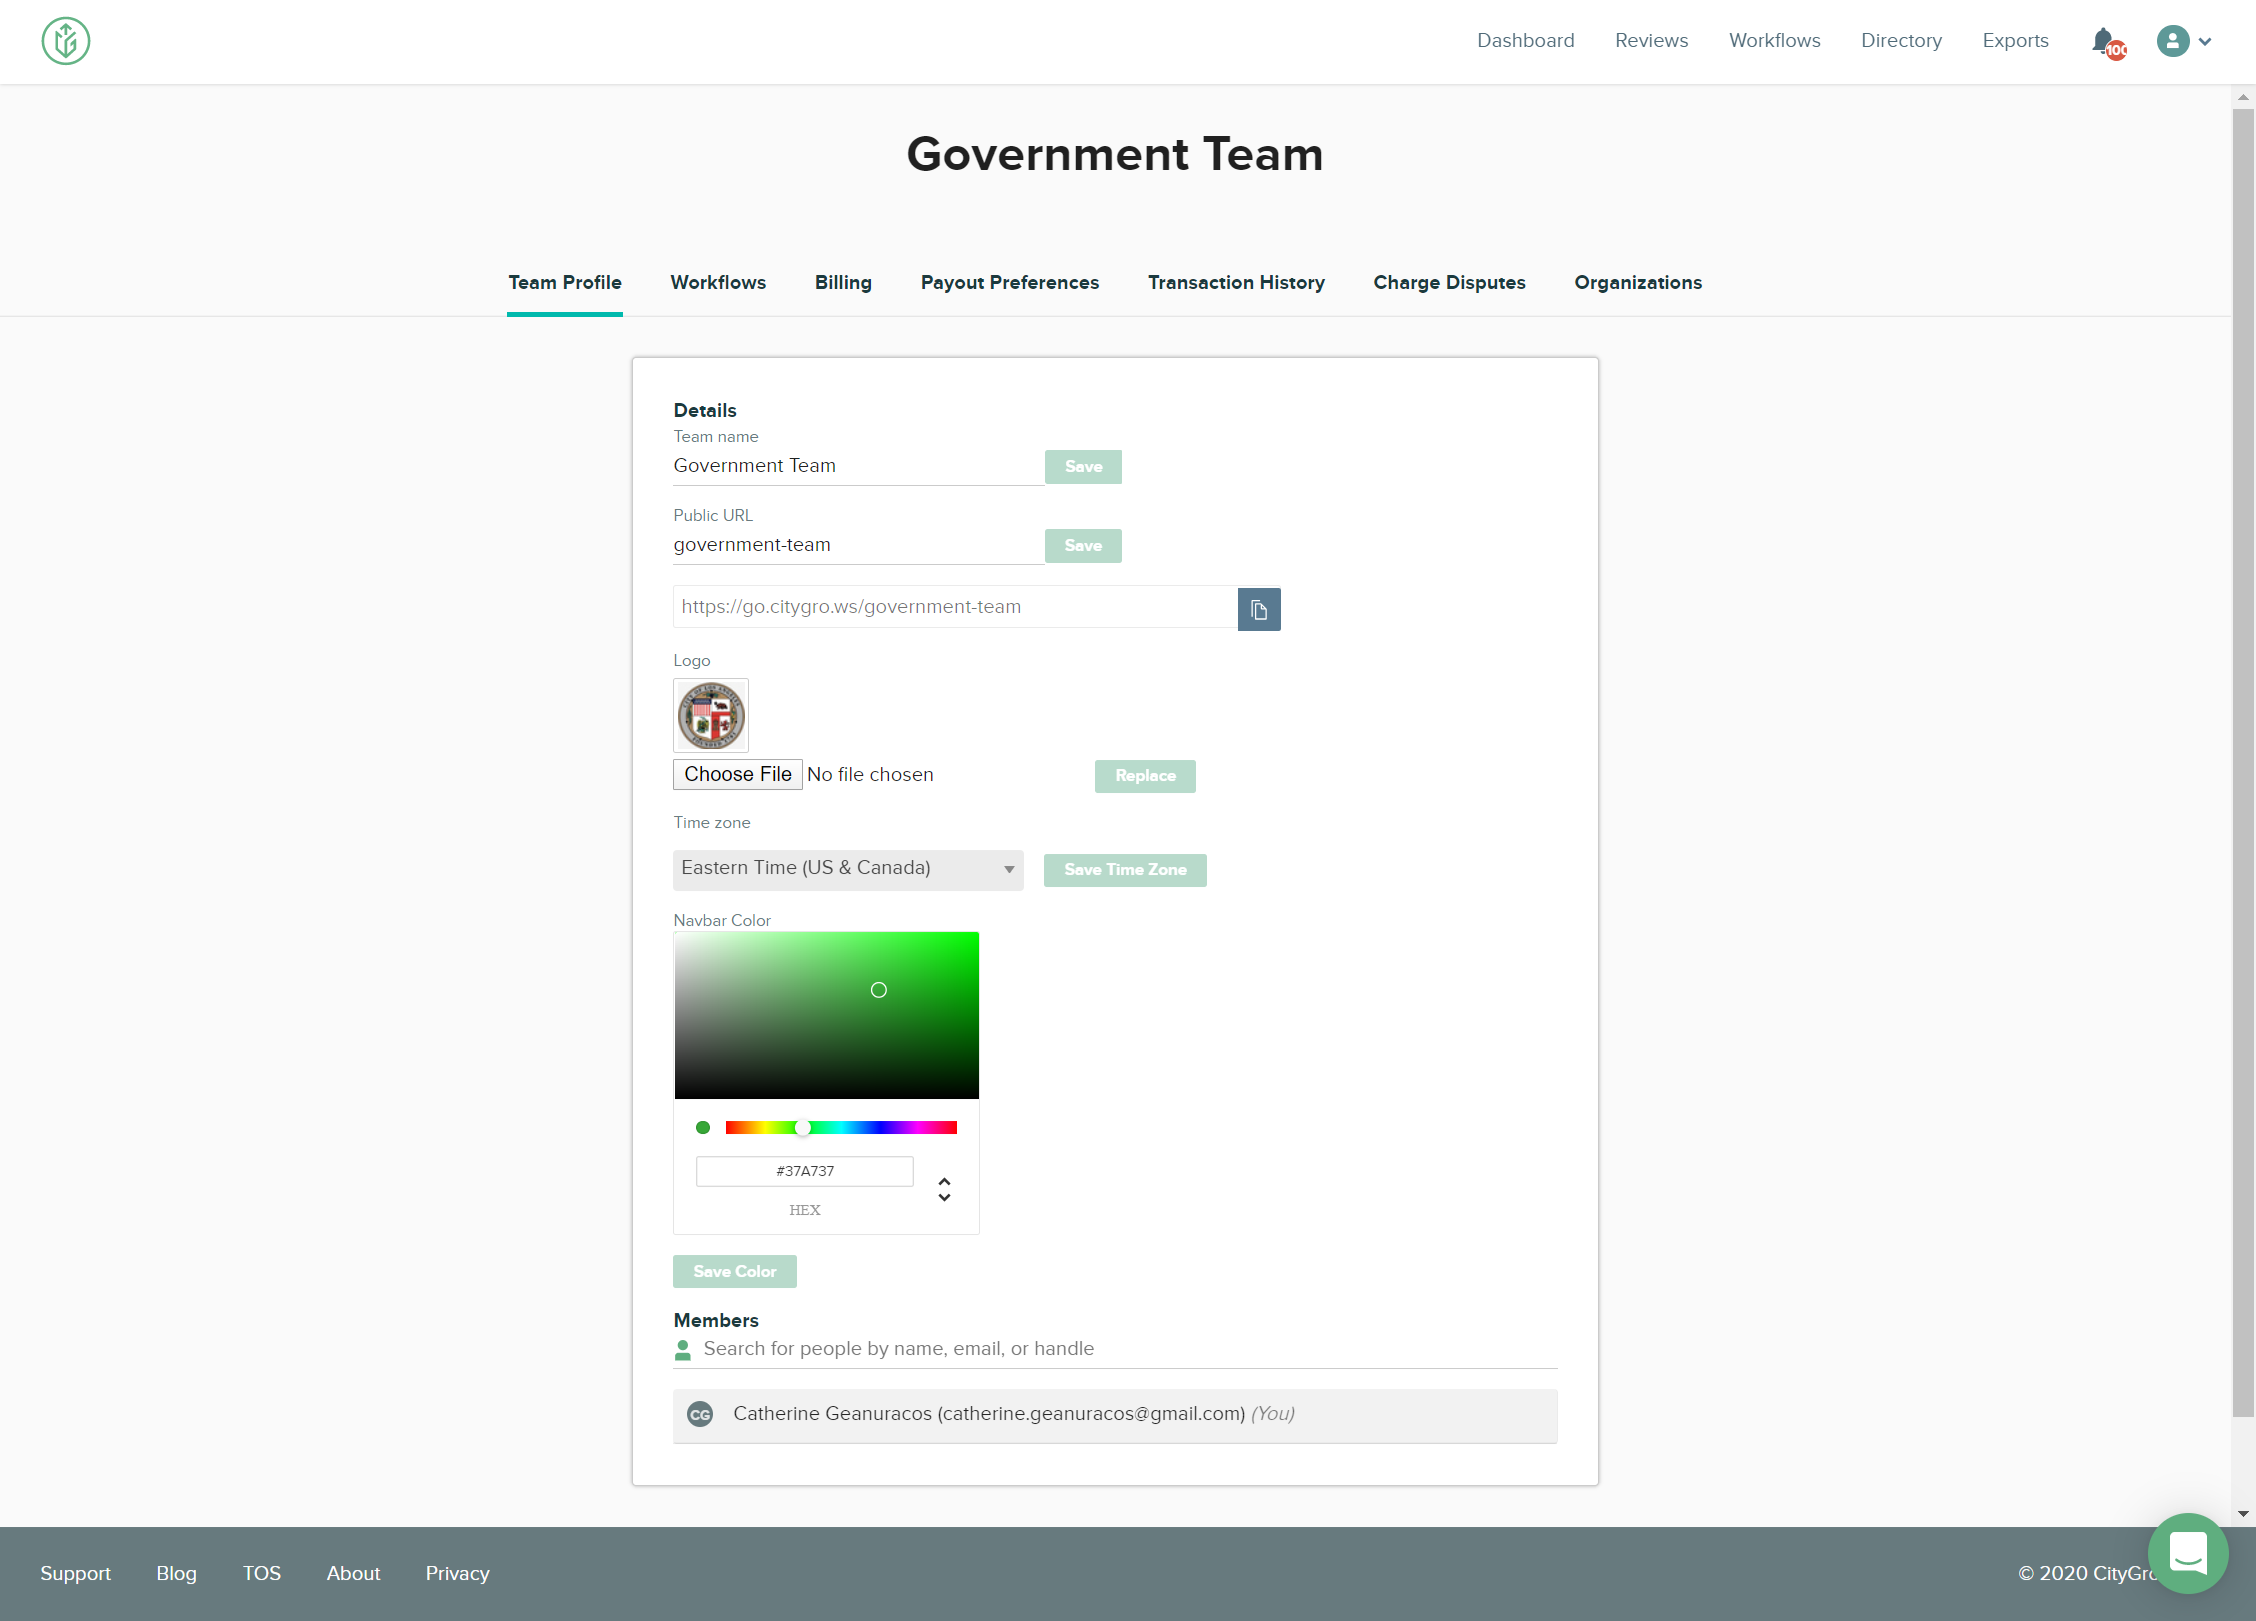 CityGrows government team page